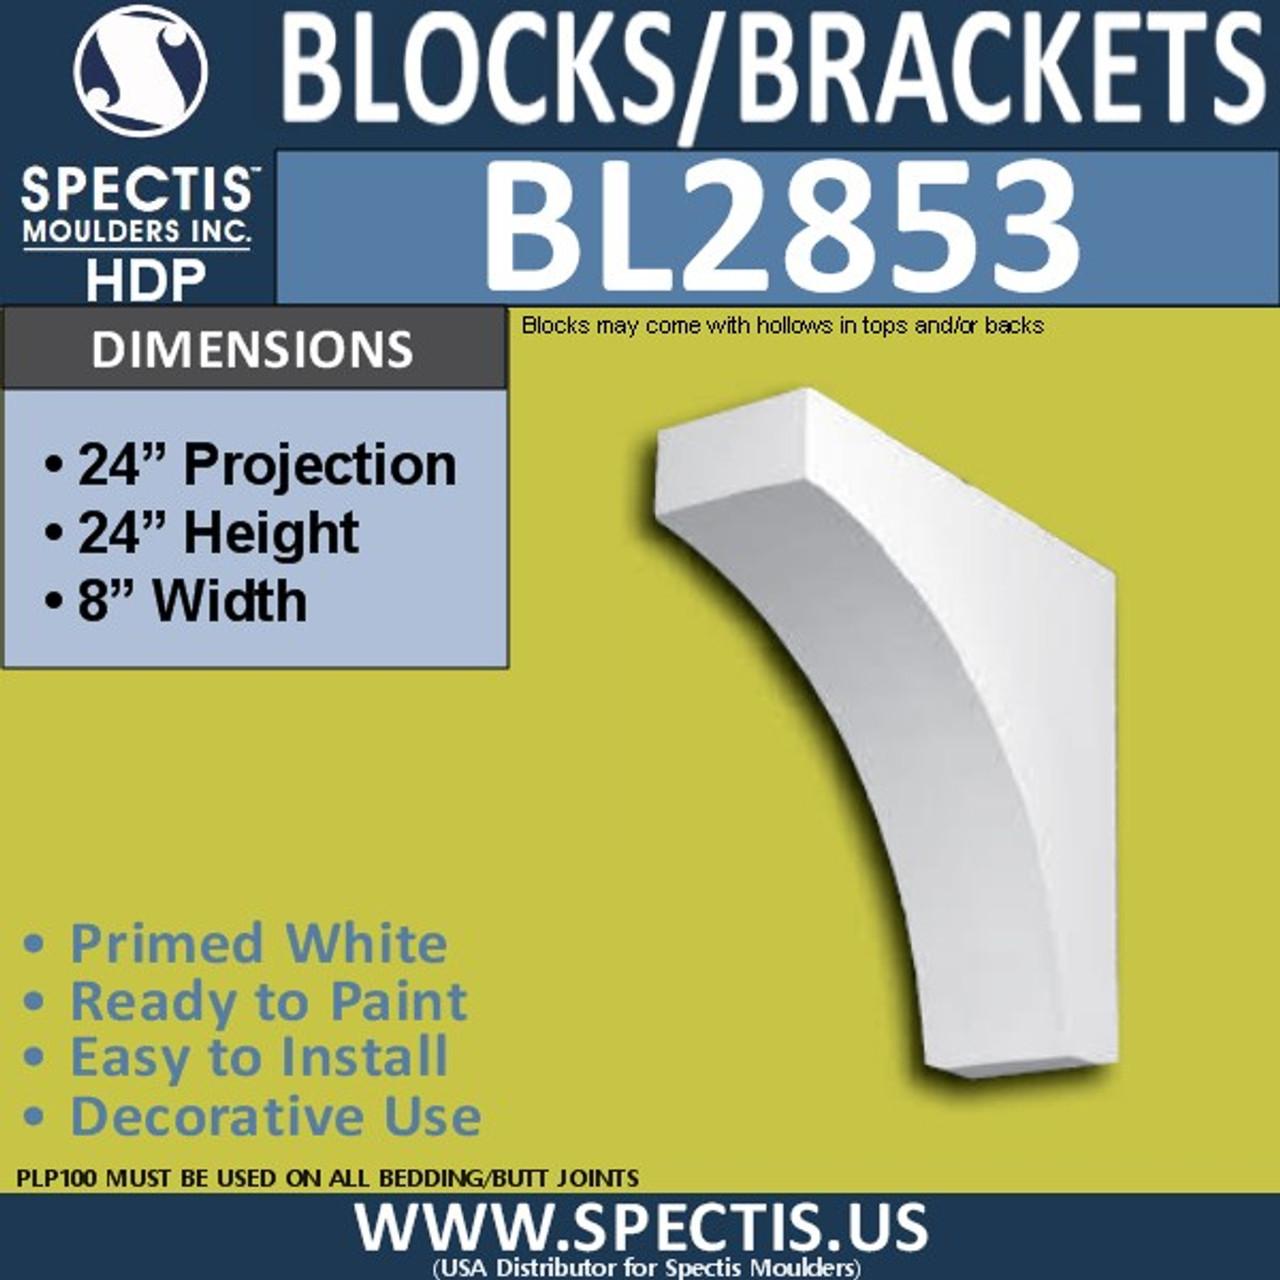 "BL2853 Eave Block or Bracket 8""W x 24""H x 24"" P"